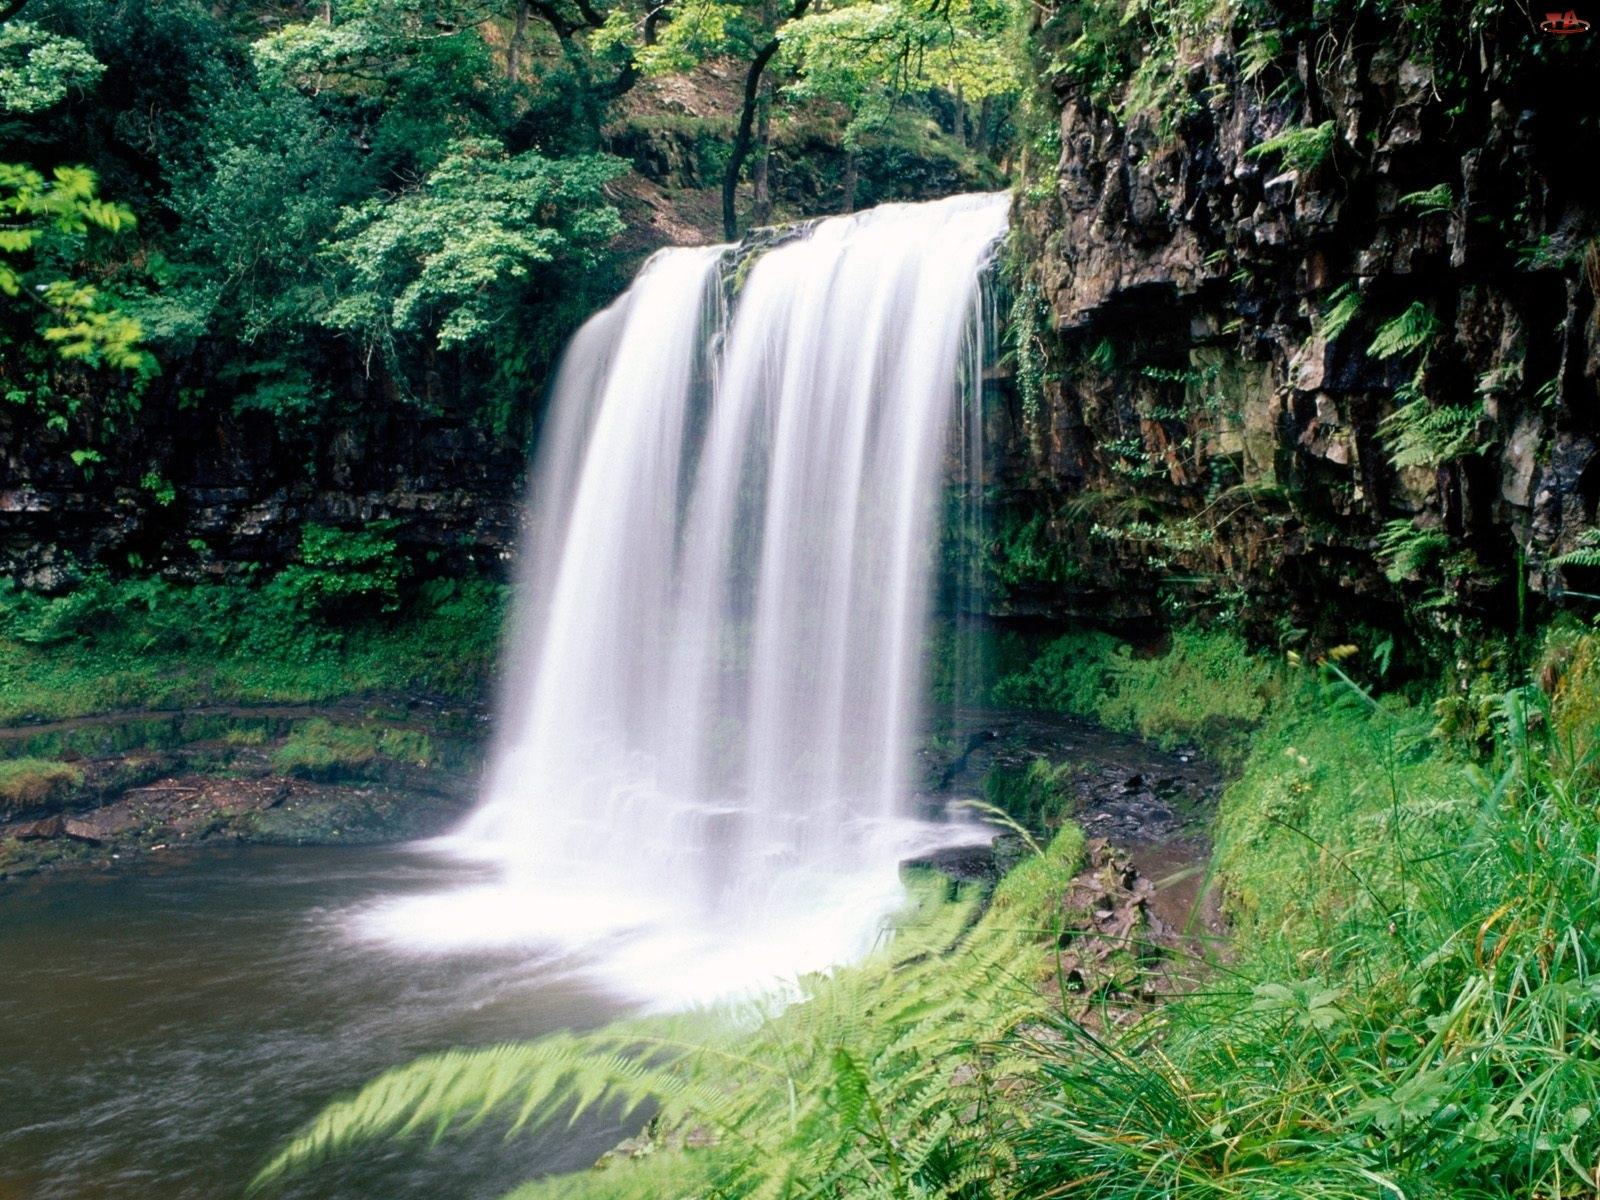 Las, Wodospad, Skała